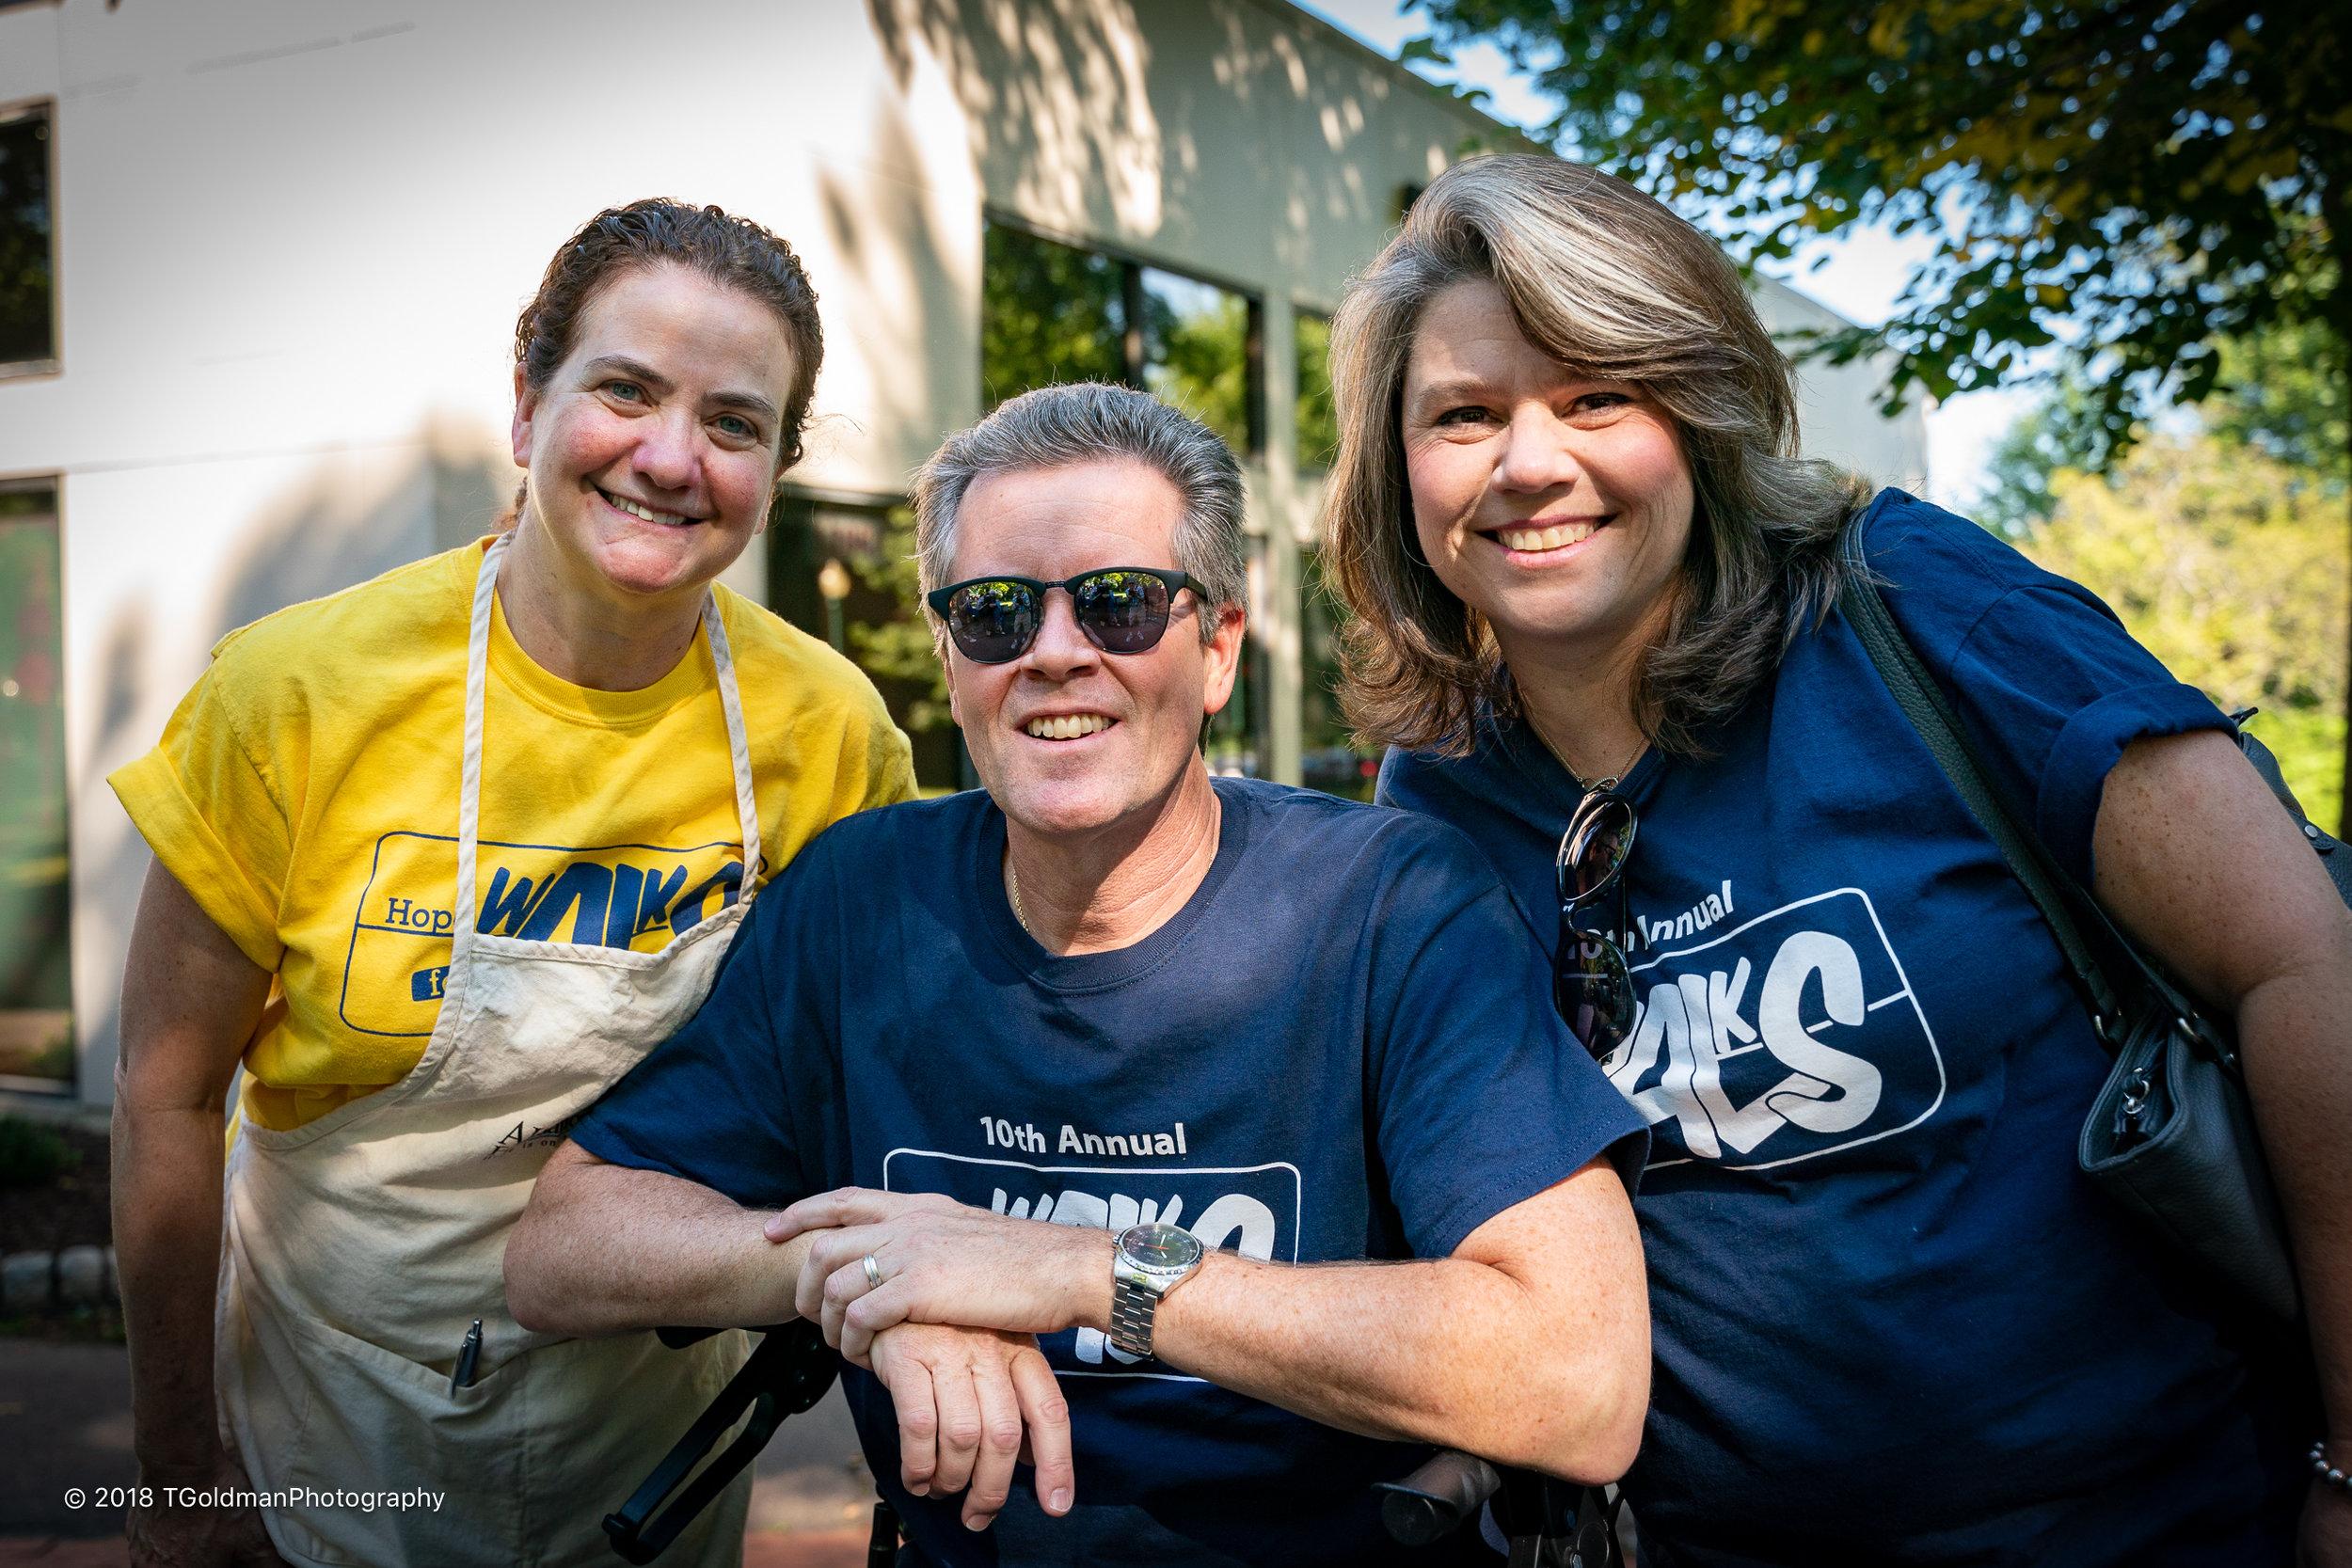 ALS Hope Walk 2018-4.jpg